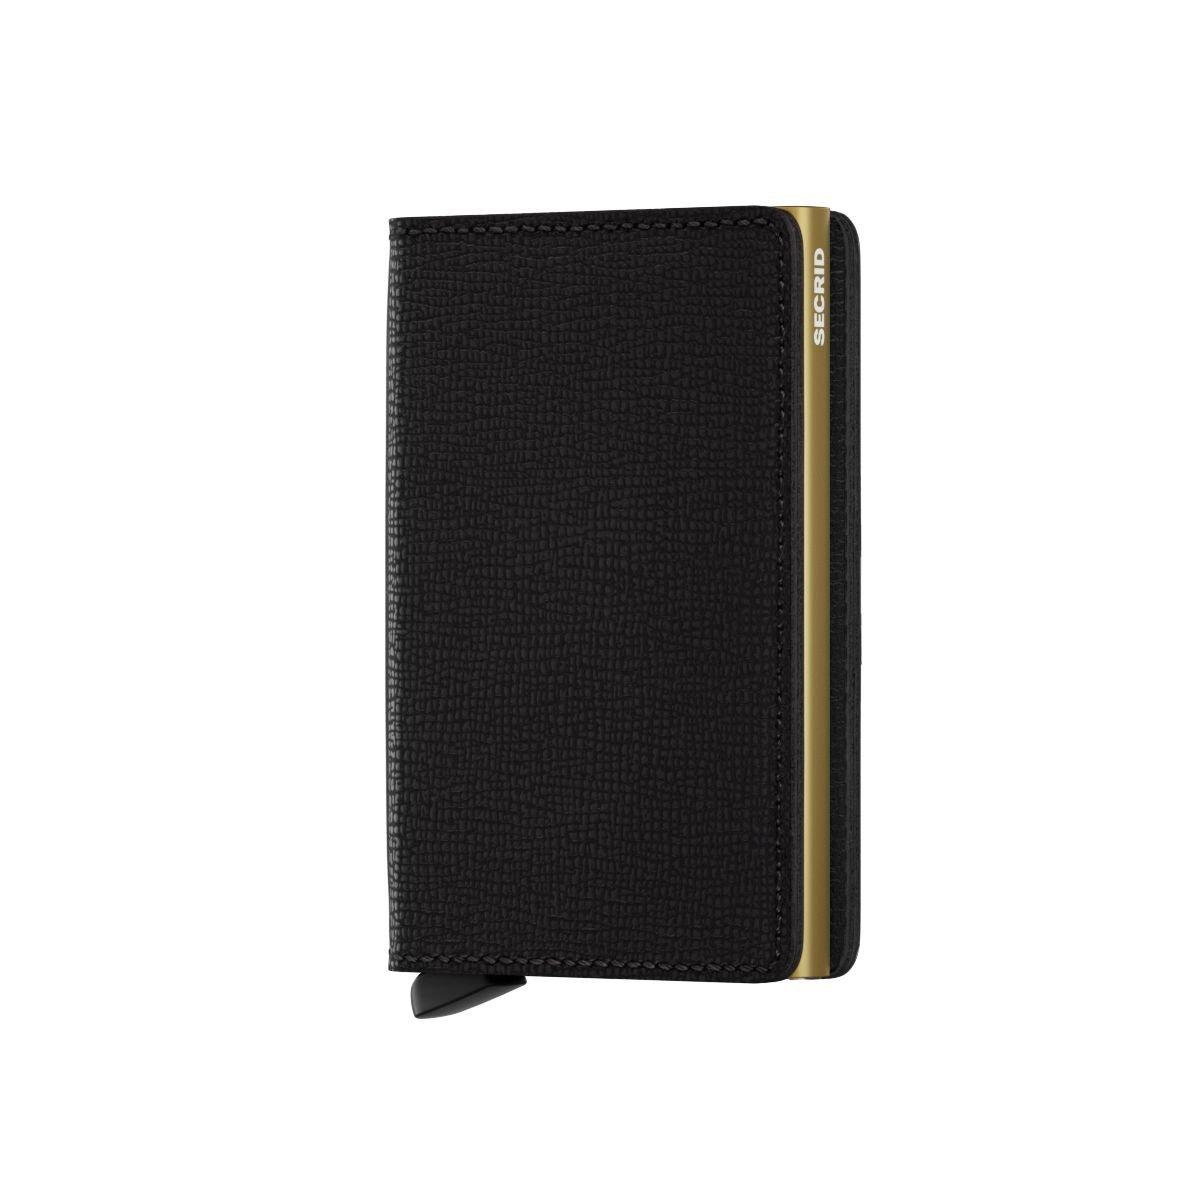 3dfdcf227fa Secrid Slim Wallet Portemonnee Crisple Black Gold: Amazon.de: Bekleidung